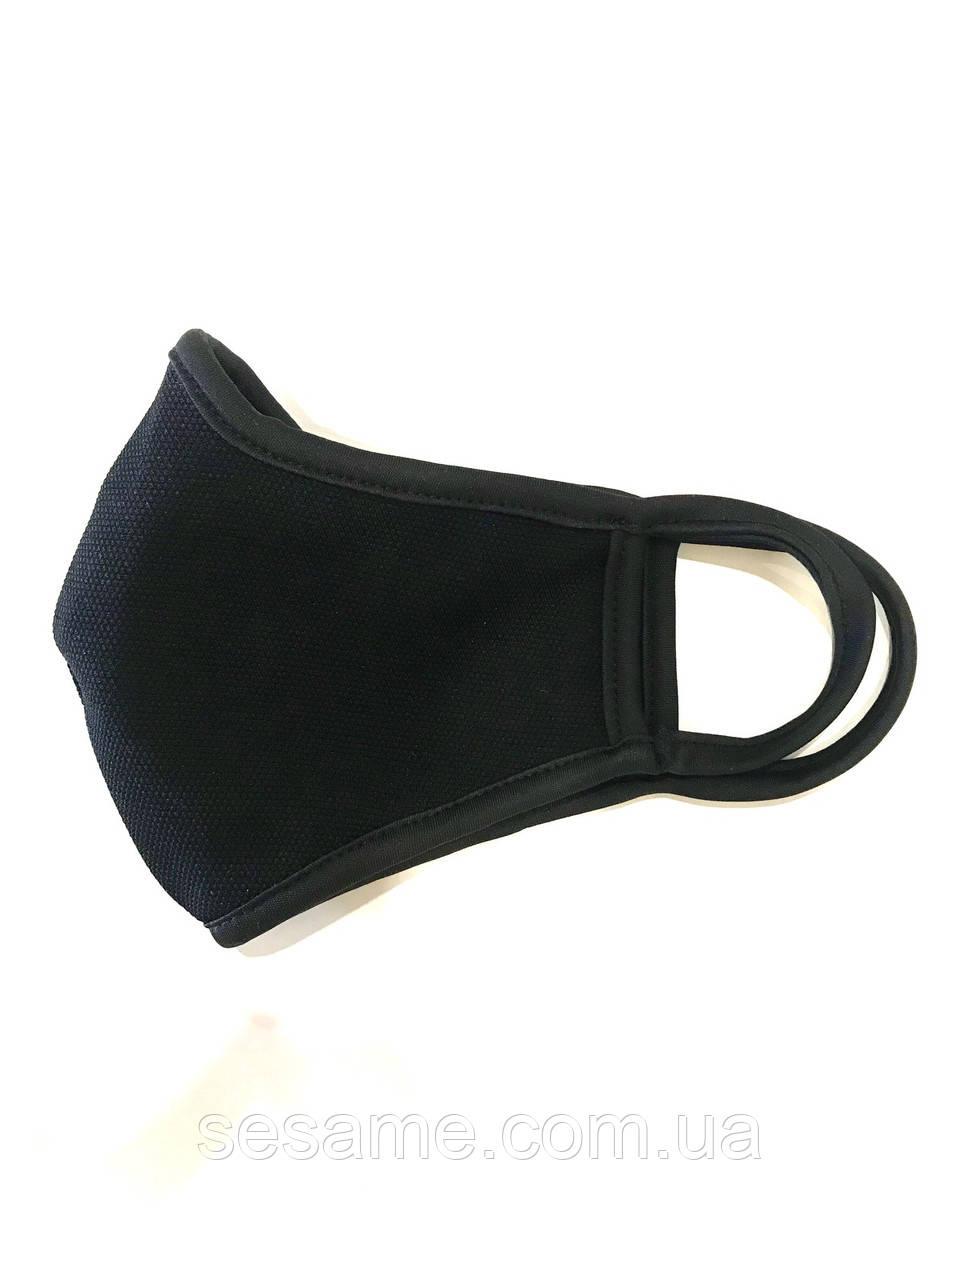 Маска чорна тканинна багаторазова захисна двошарова (5шт.уп)